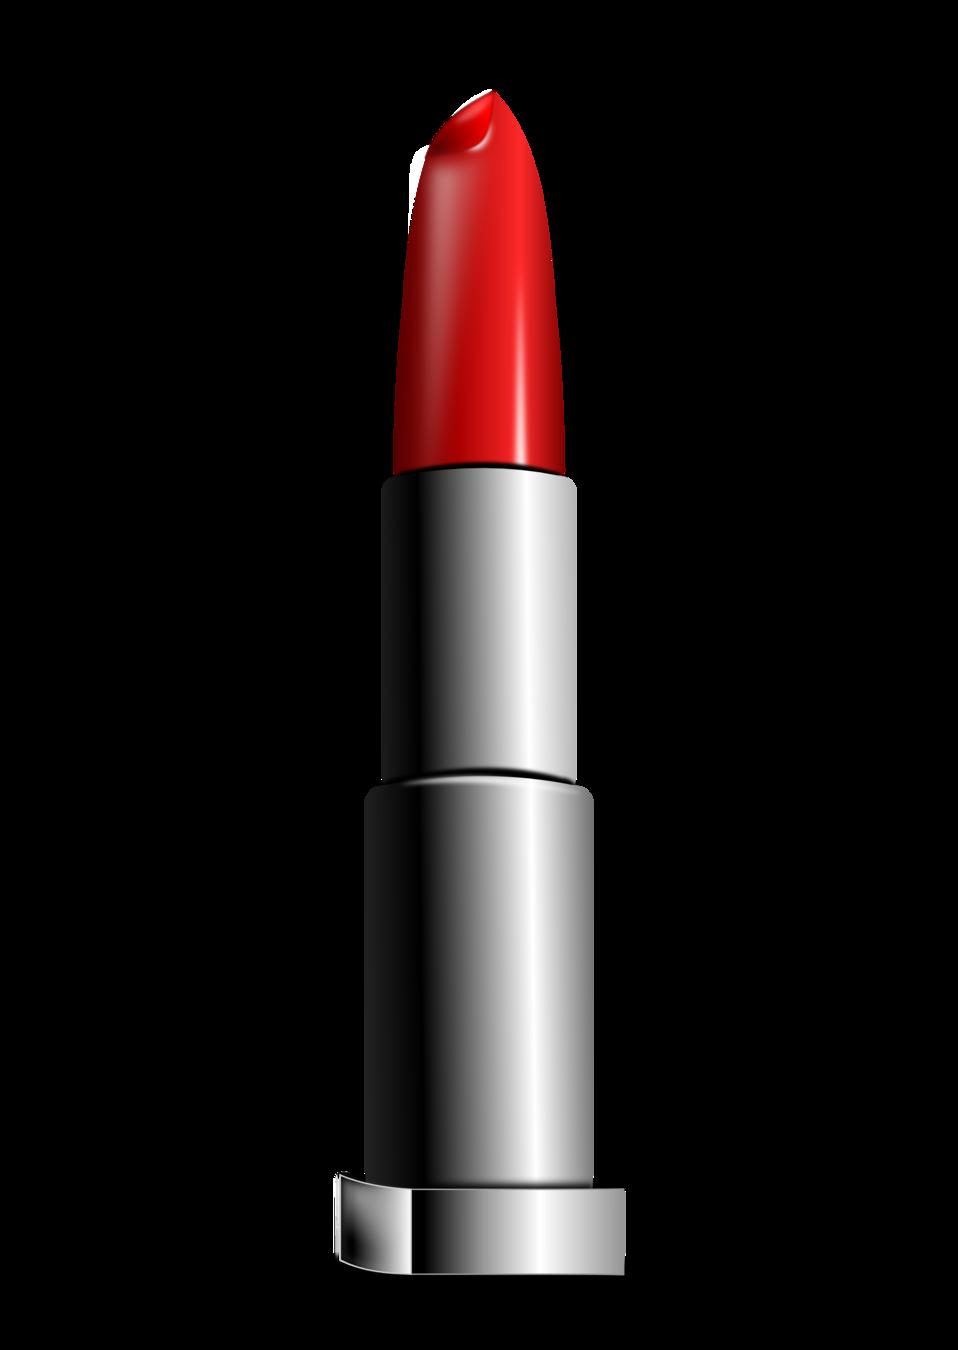 Lipstick clipart vector. Public domain clip art